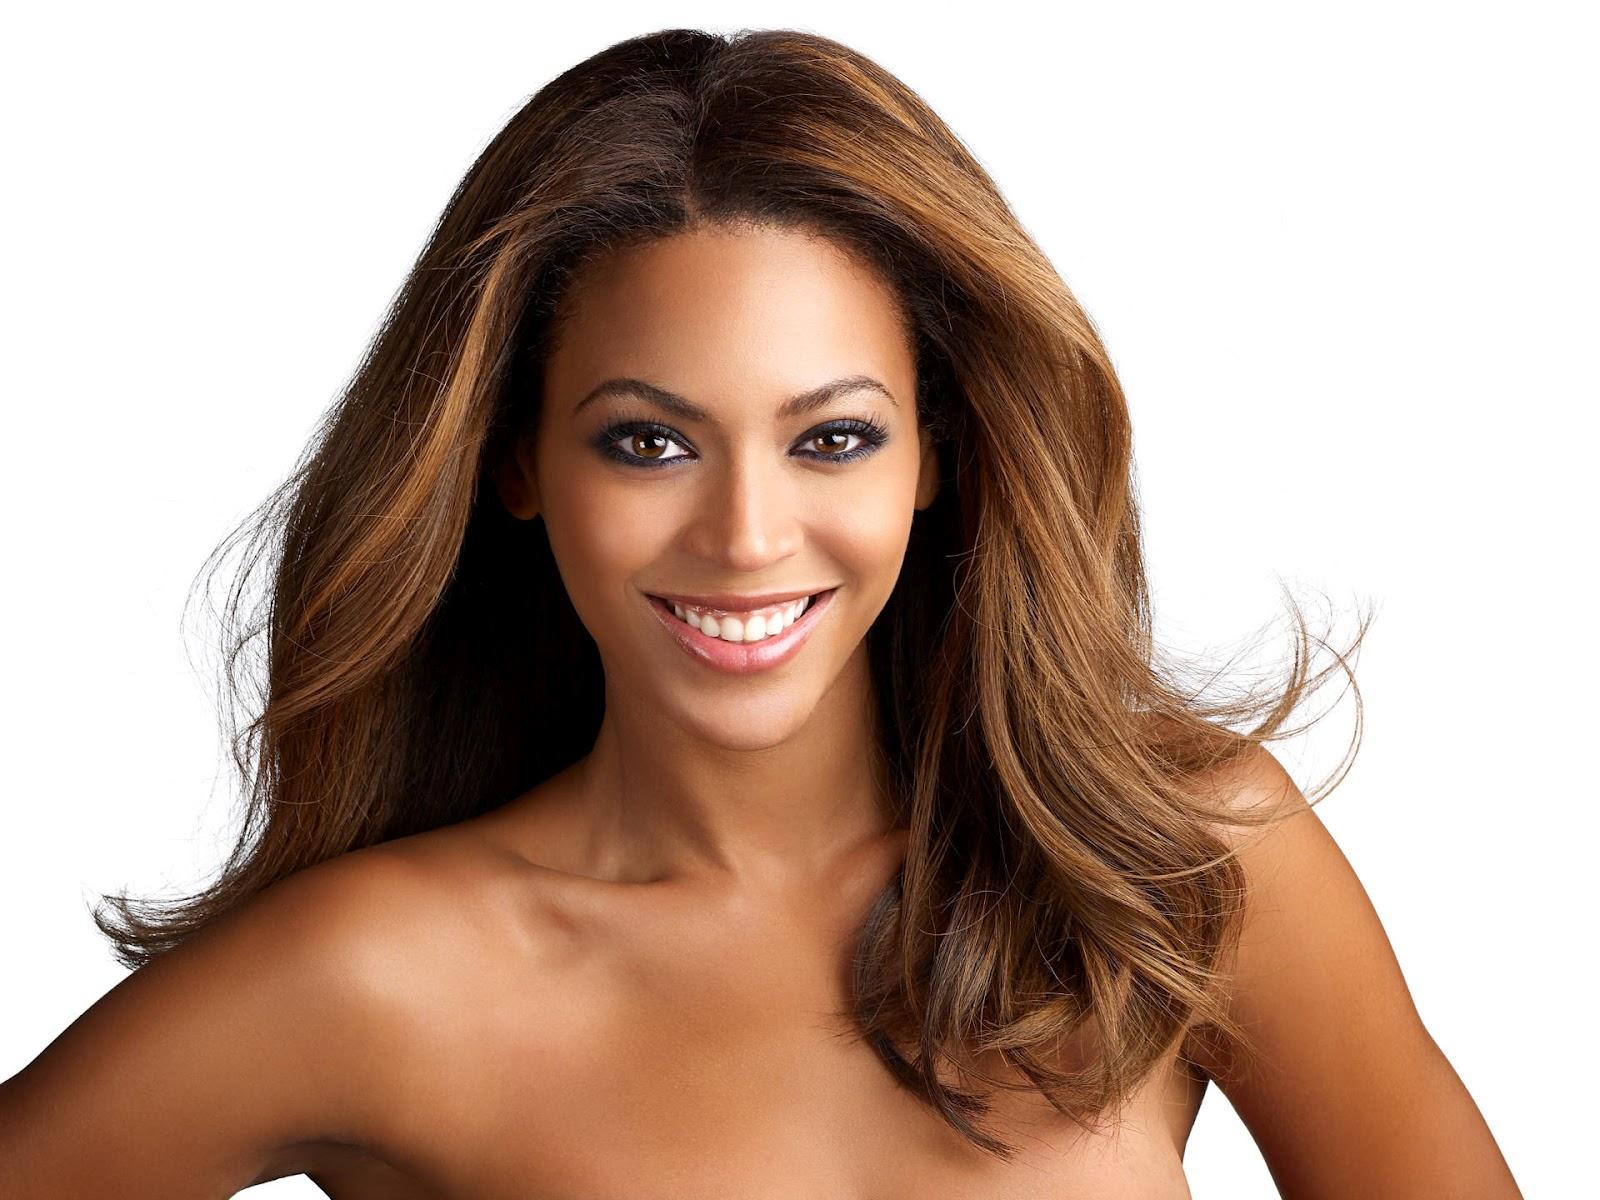 http://1.bp.blogspot.com/-SSN5tsZ8aDY/T5nNIN98s1I/AAAAAAAAEAc/nA1QHdOW2qI/s1600/Beyonce-Wallpaper-2.jpg